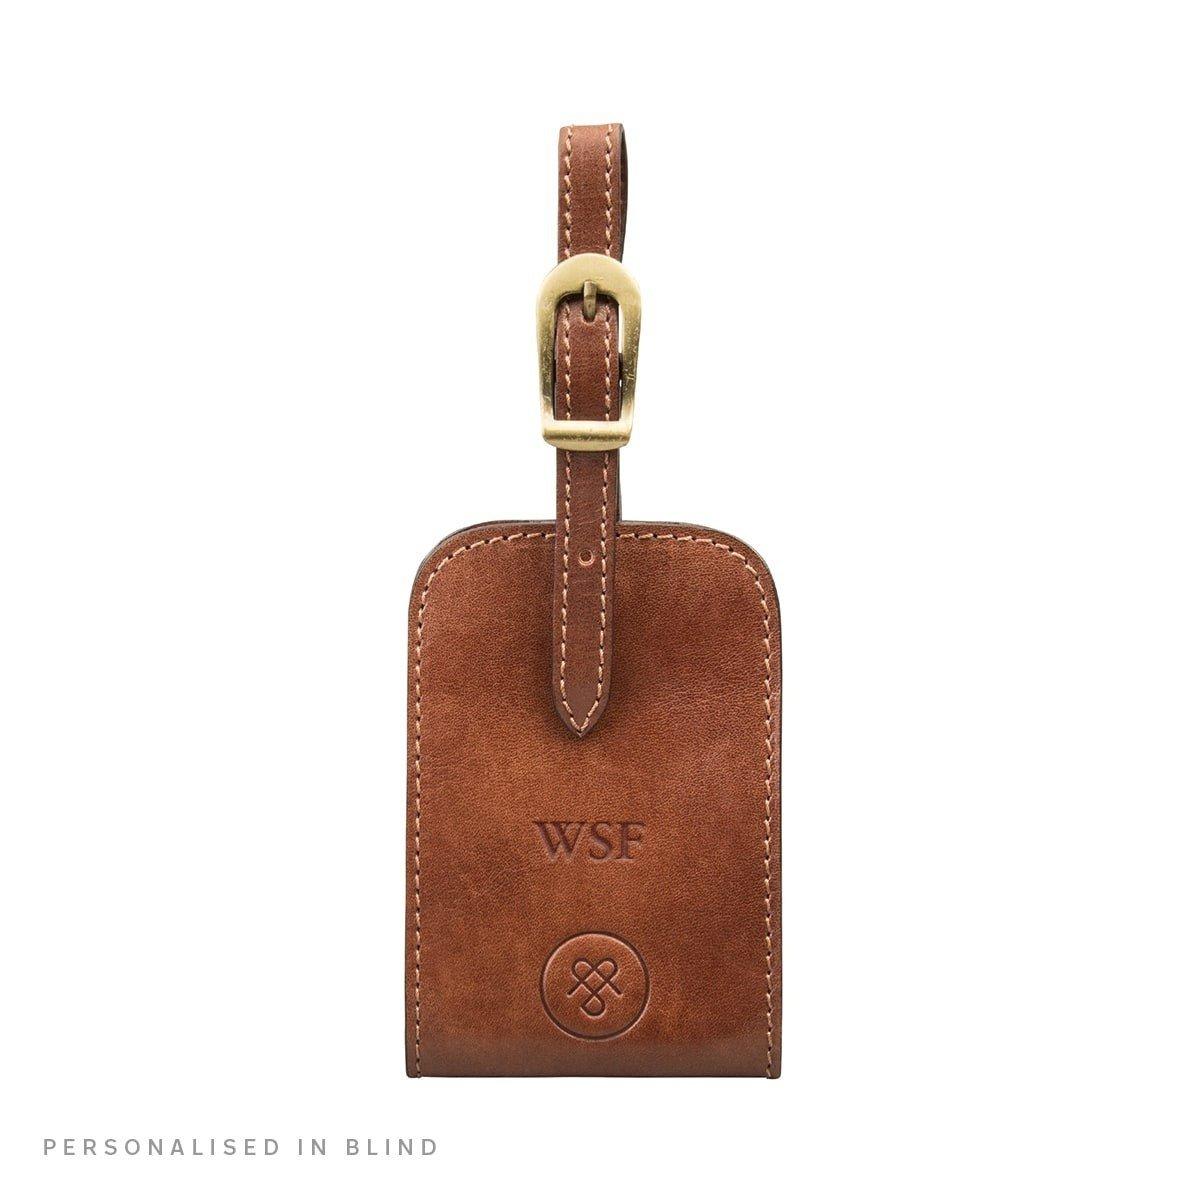 Maxwell Scott® Personalised Luxury Black ID Luggage Tags (The Ledro) - One Size Maxwell Scott Bags Ledro_819_3